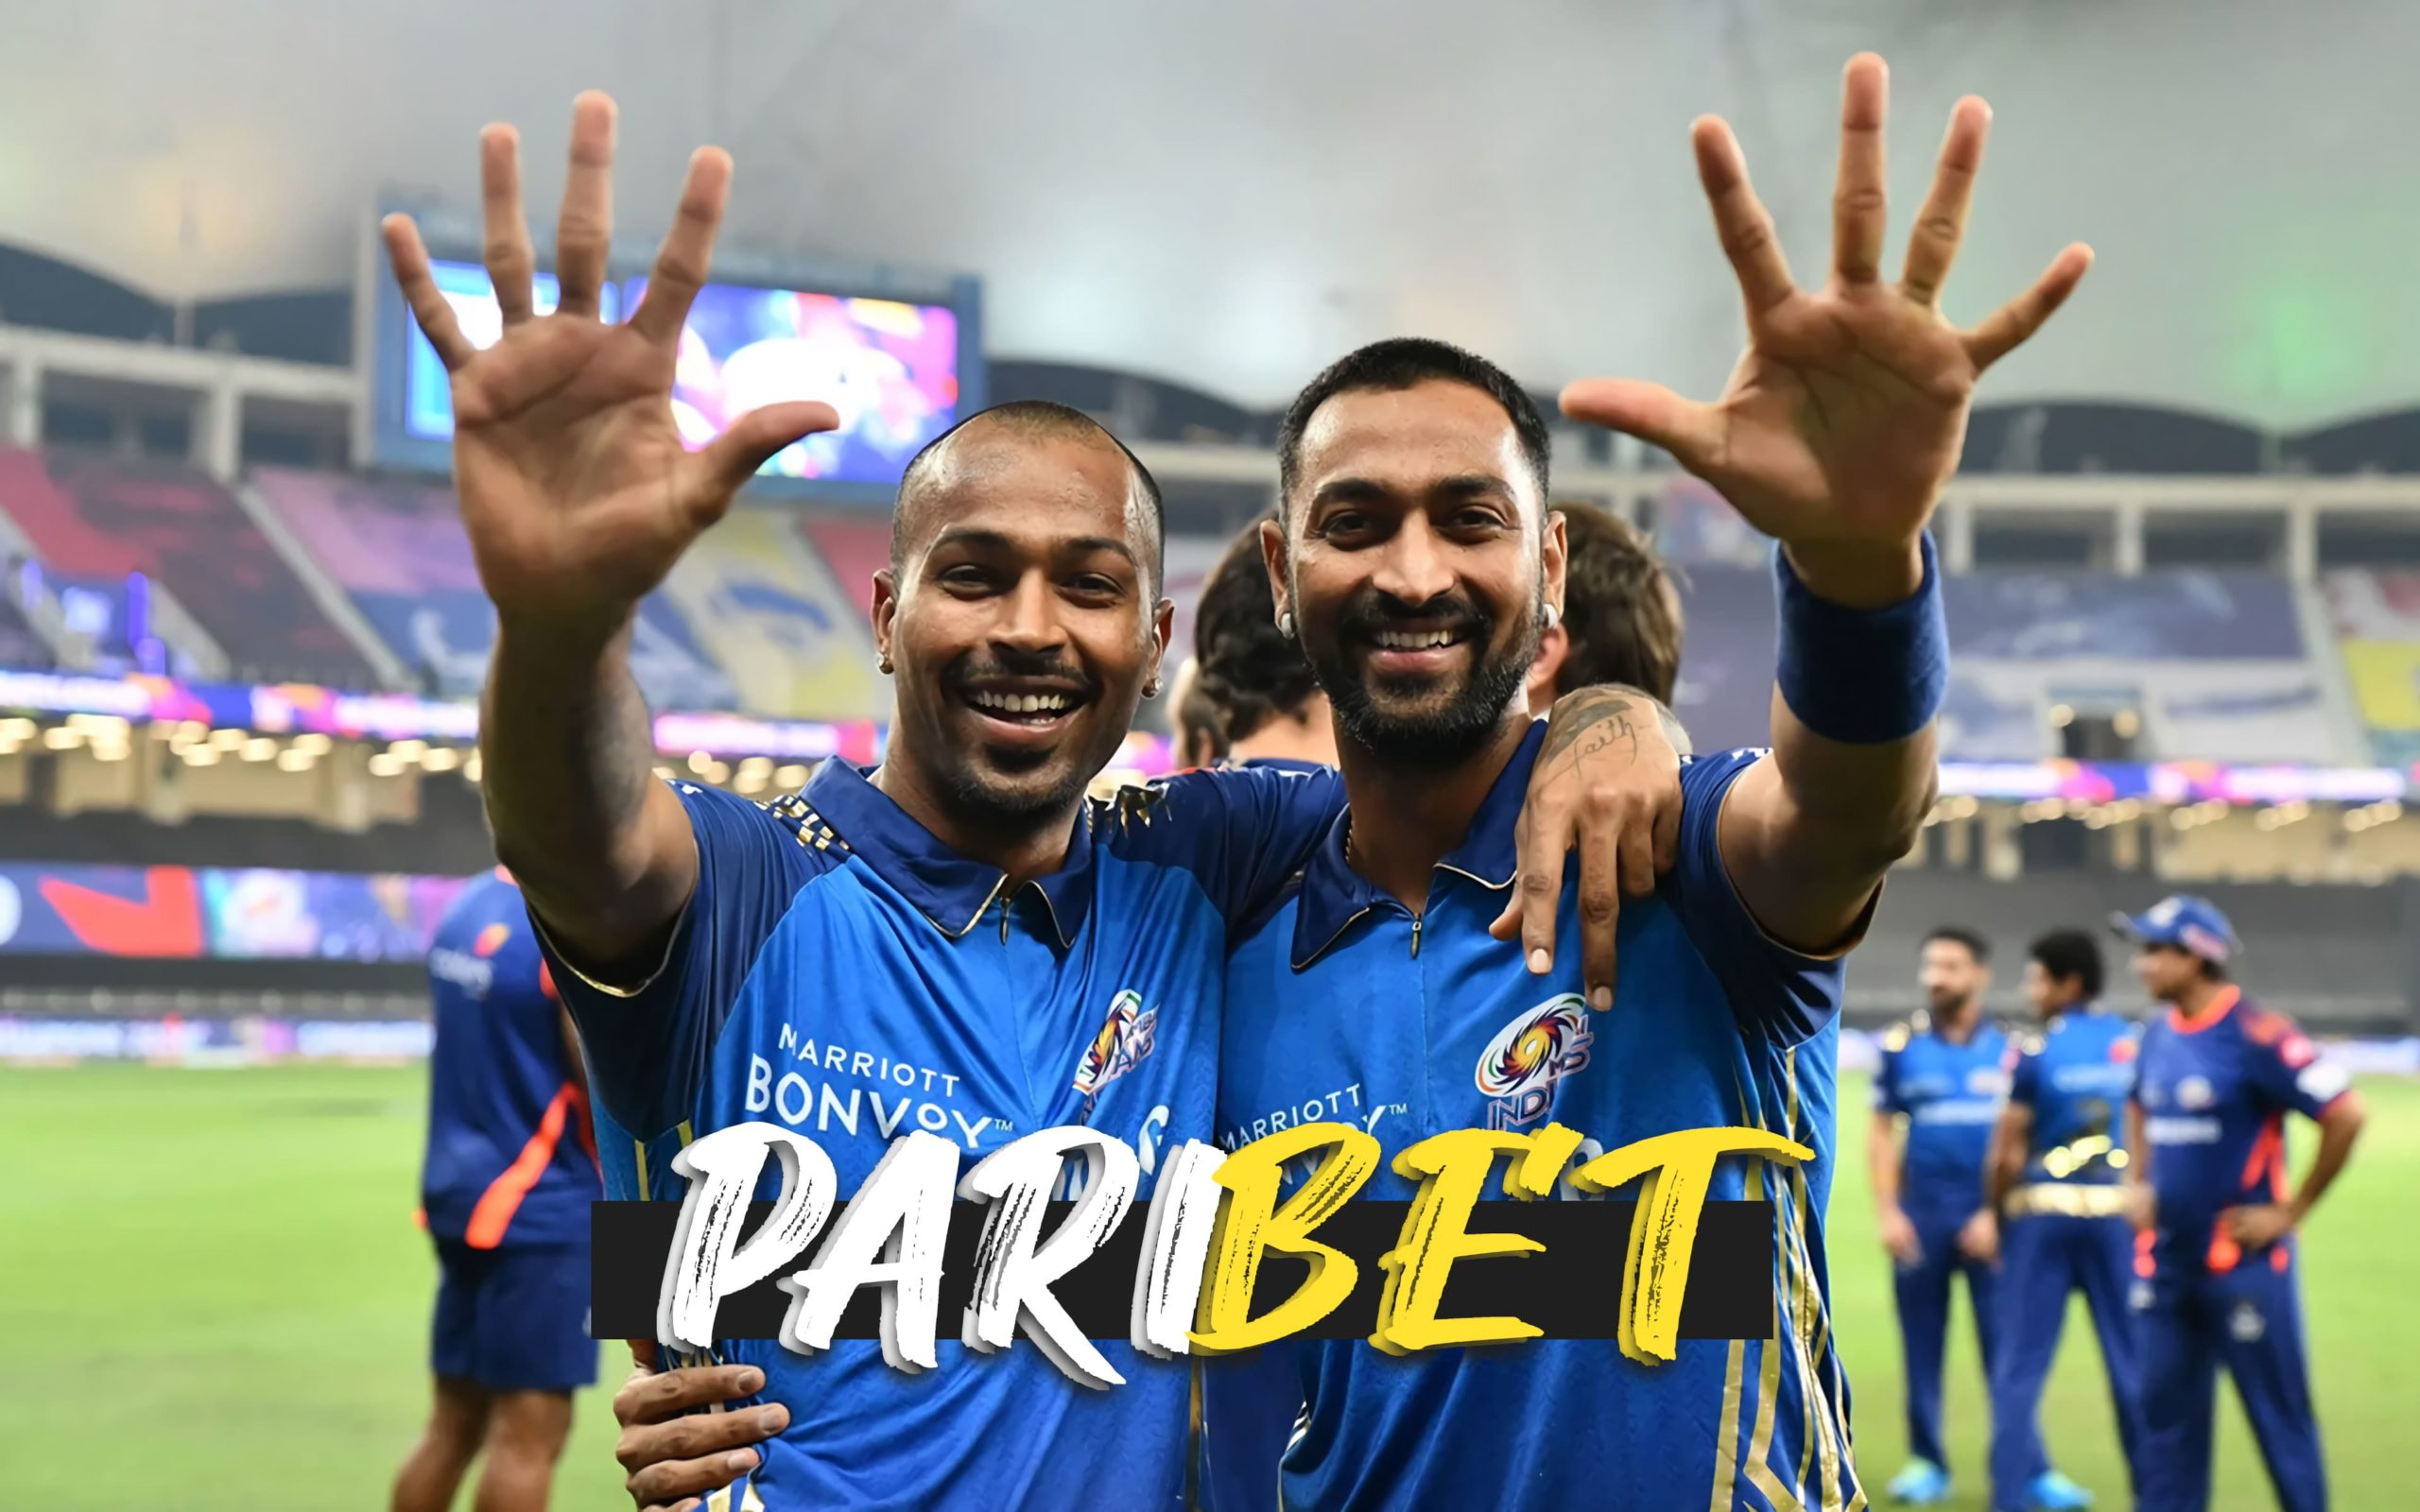 Paribet online betting india guade